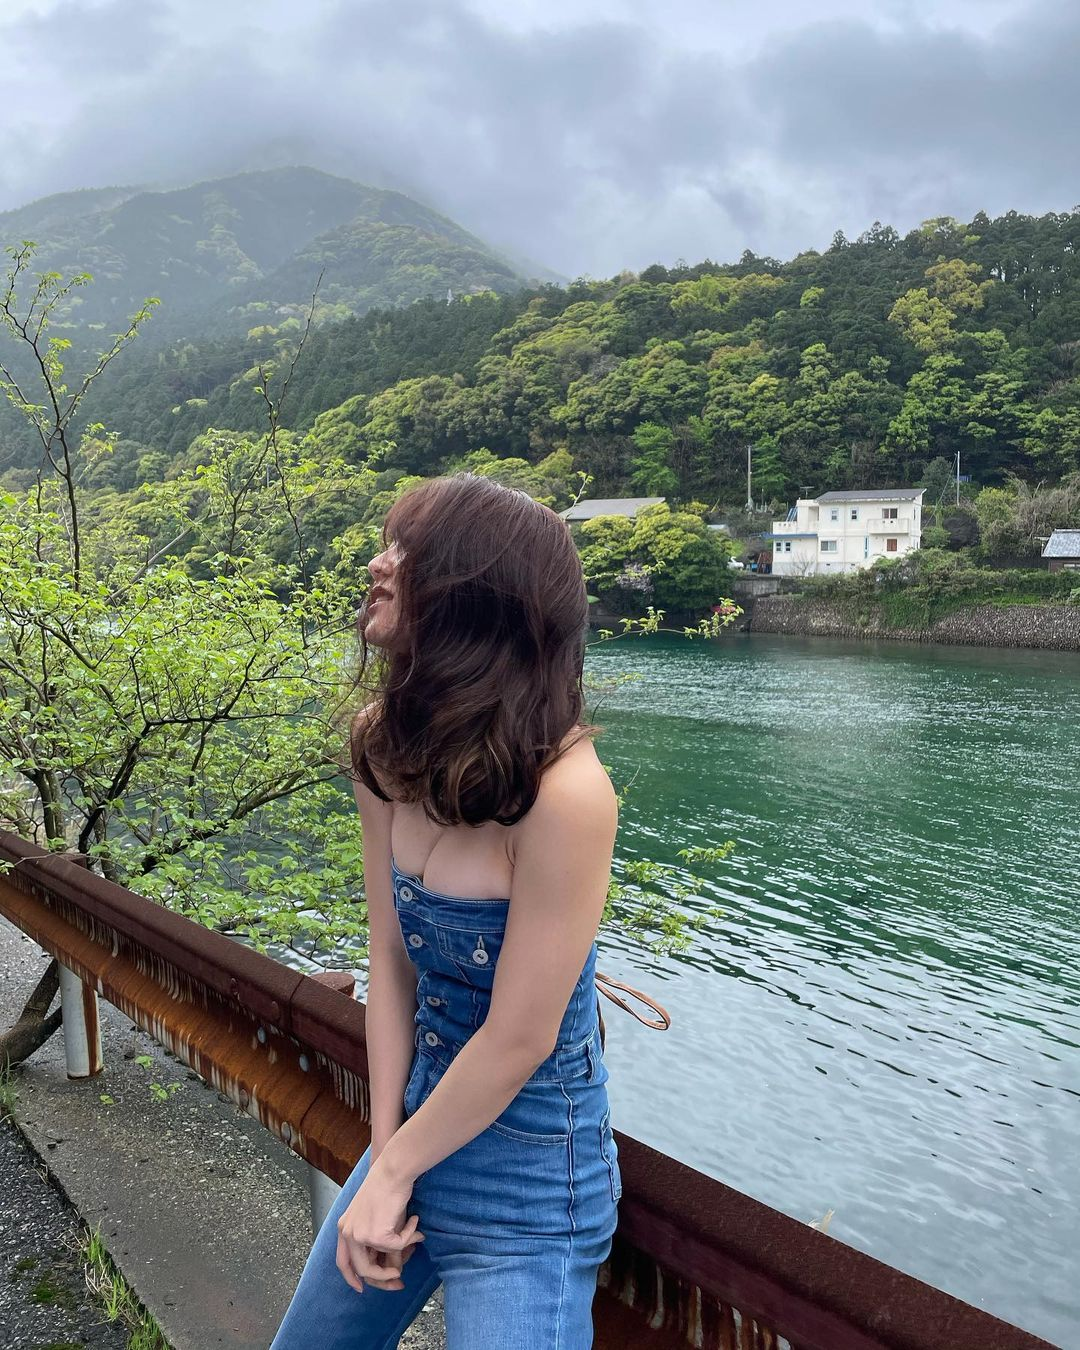 NMB48白間美瑠「色っぽくてかっこいい!」写真集『REBORN』オフショット公開にファン歓喜【画像8枚】の画像005